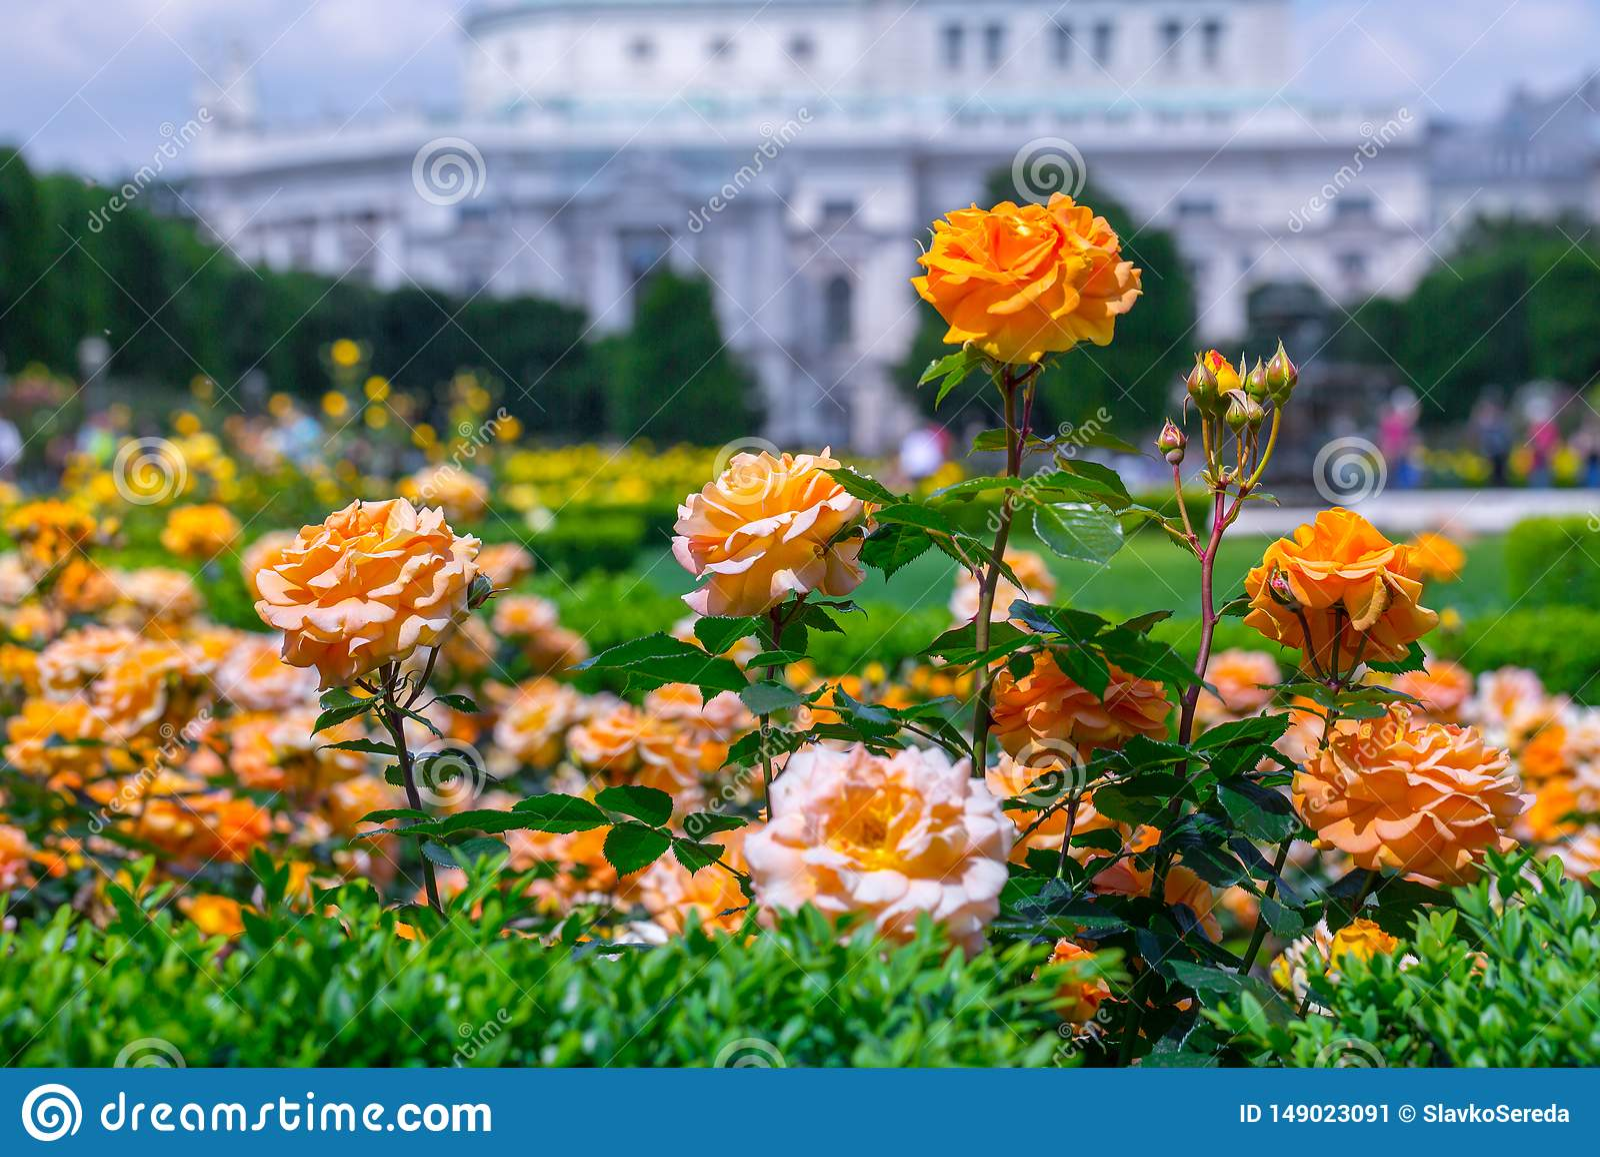 Lush blooming orange roses in rose garden. Volksgarten(people's park) in Vienna, Austria